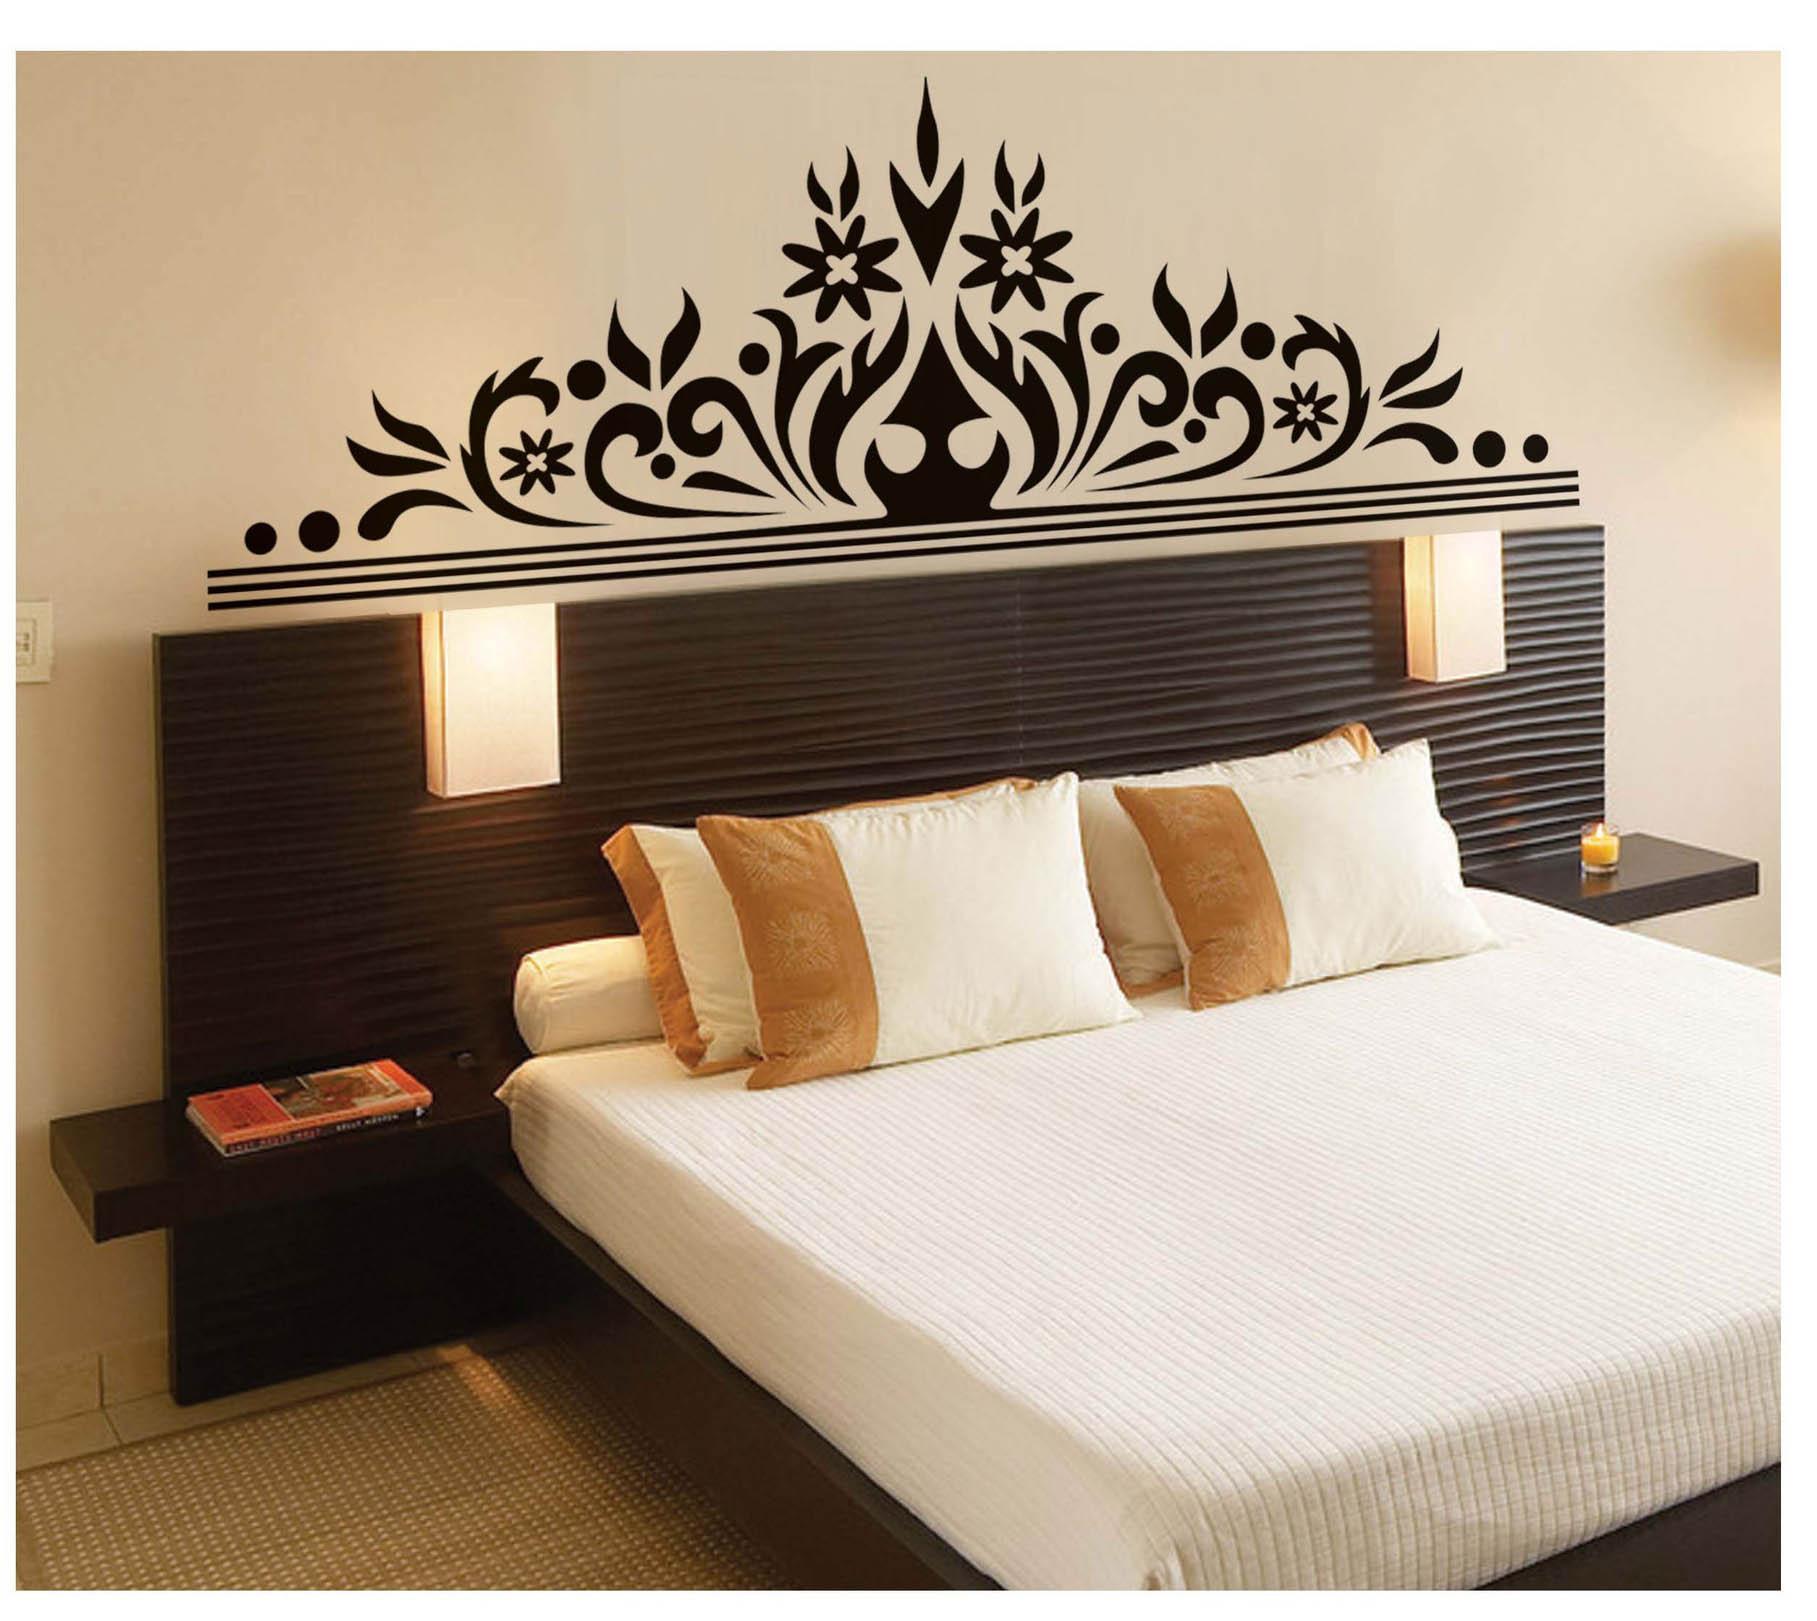 Bedroom Wall Art Decal Sticker Headboard Wall Decoration ... on Bedroom Wall Decor  id=58532